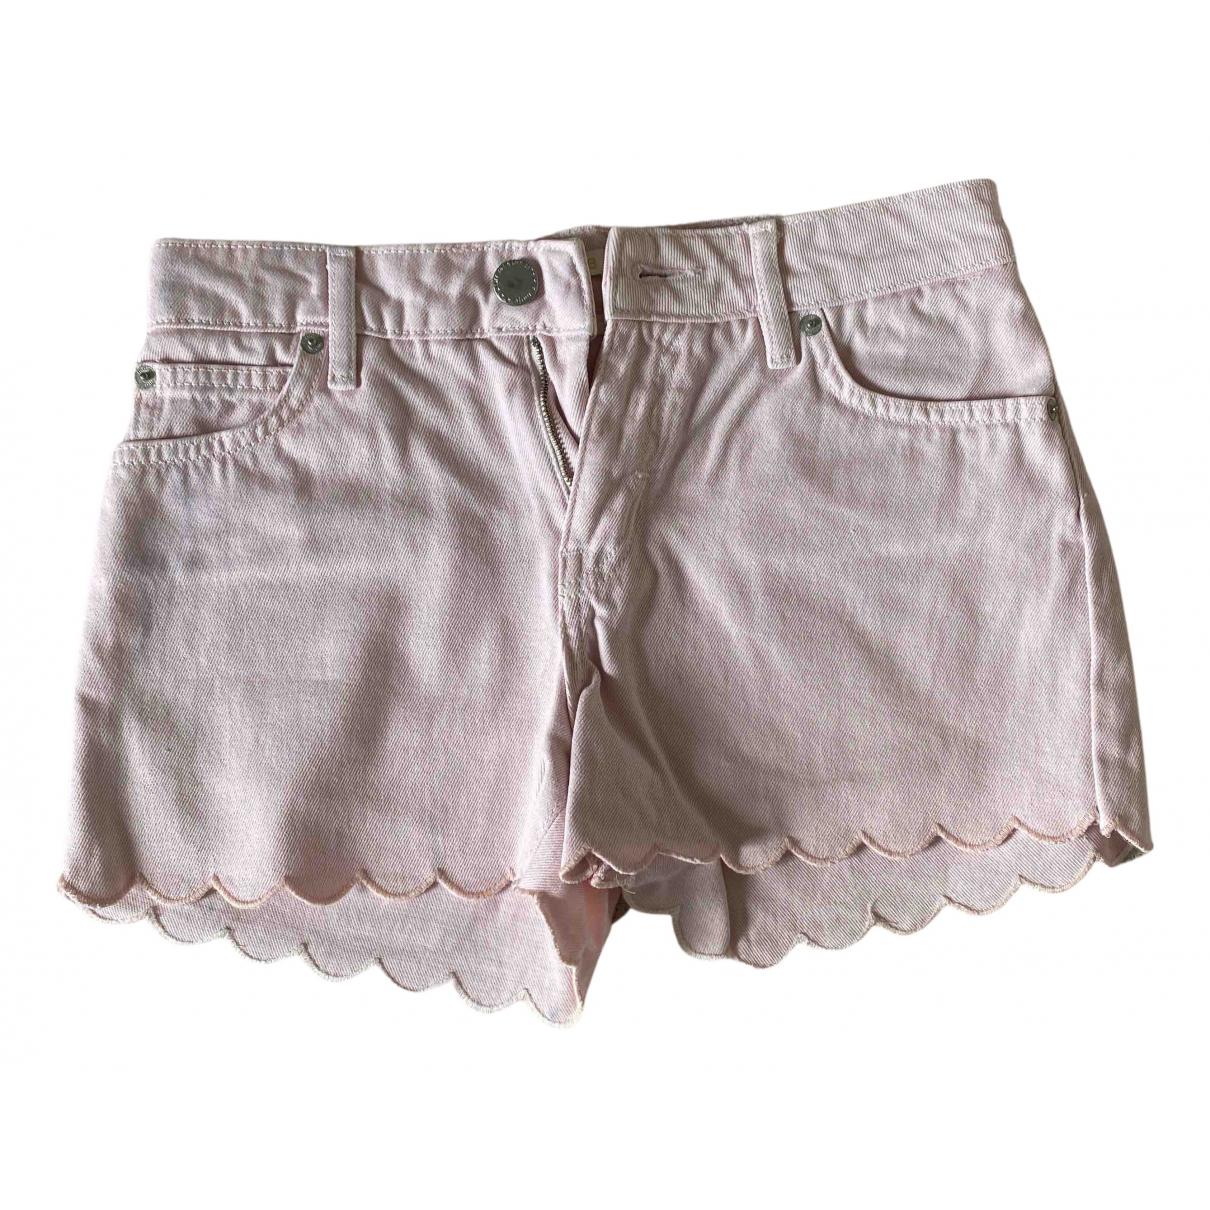 Maje Spring Summer 2019 Pink Cotton Shorts for Women 36 FR